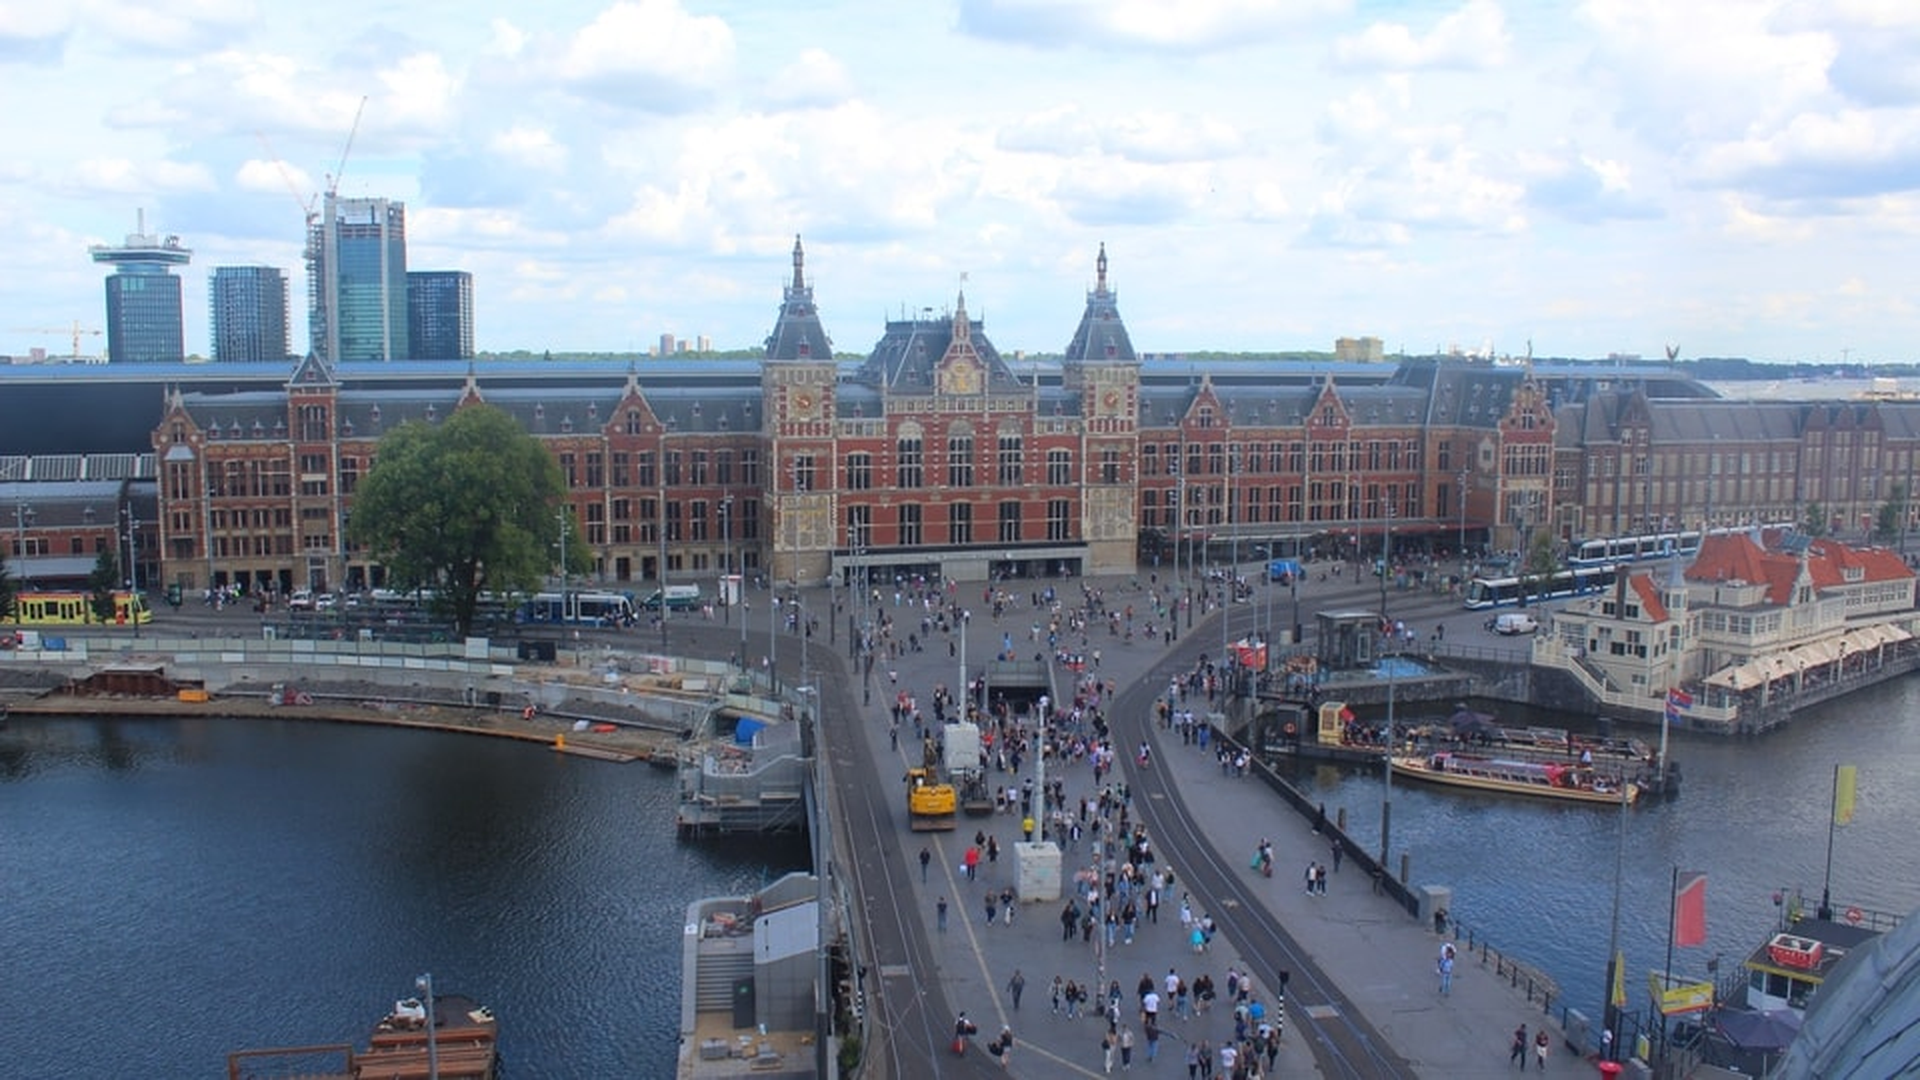 Klimmen amsterdam centraal station webcam